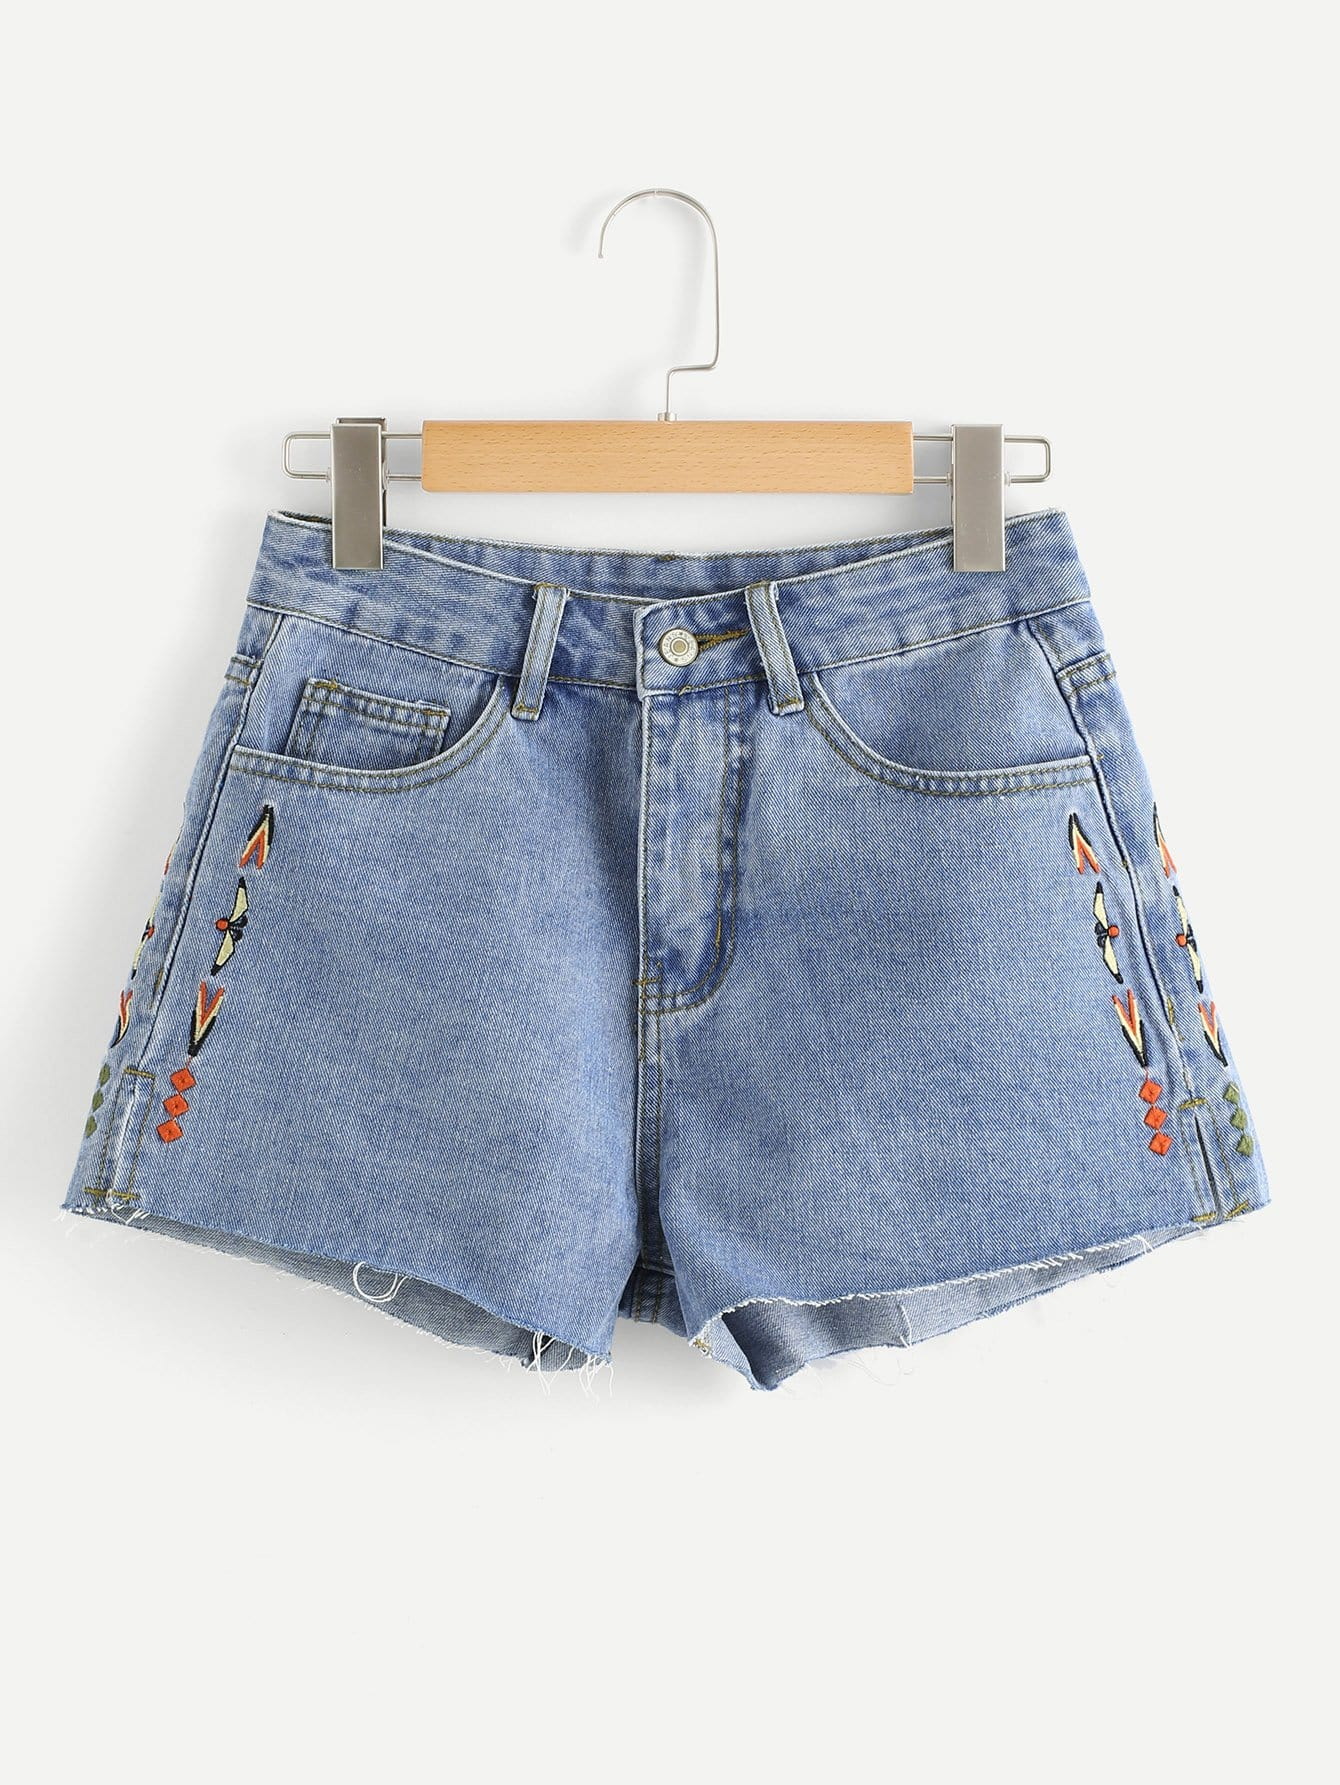 цена на Graphic Embroidered Denim Shorts